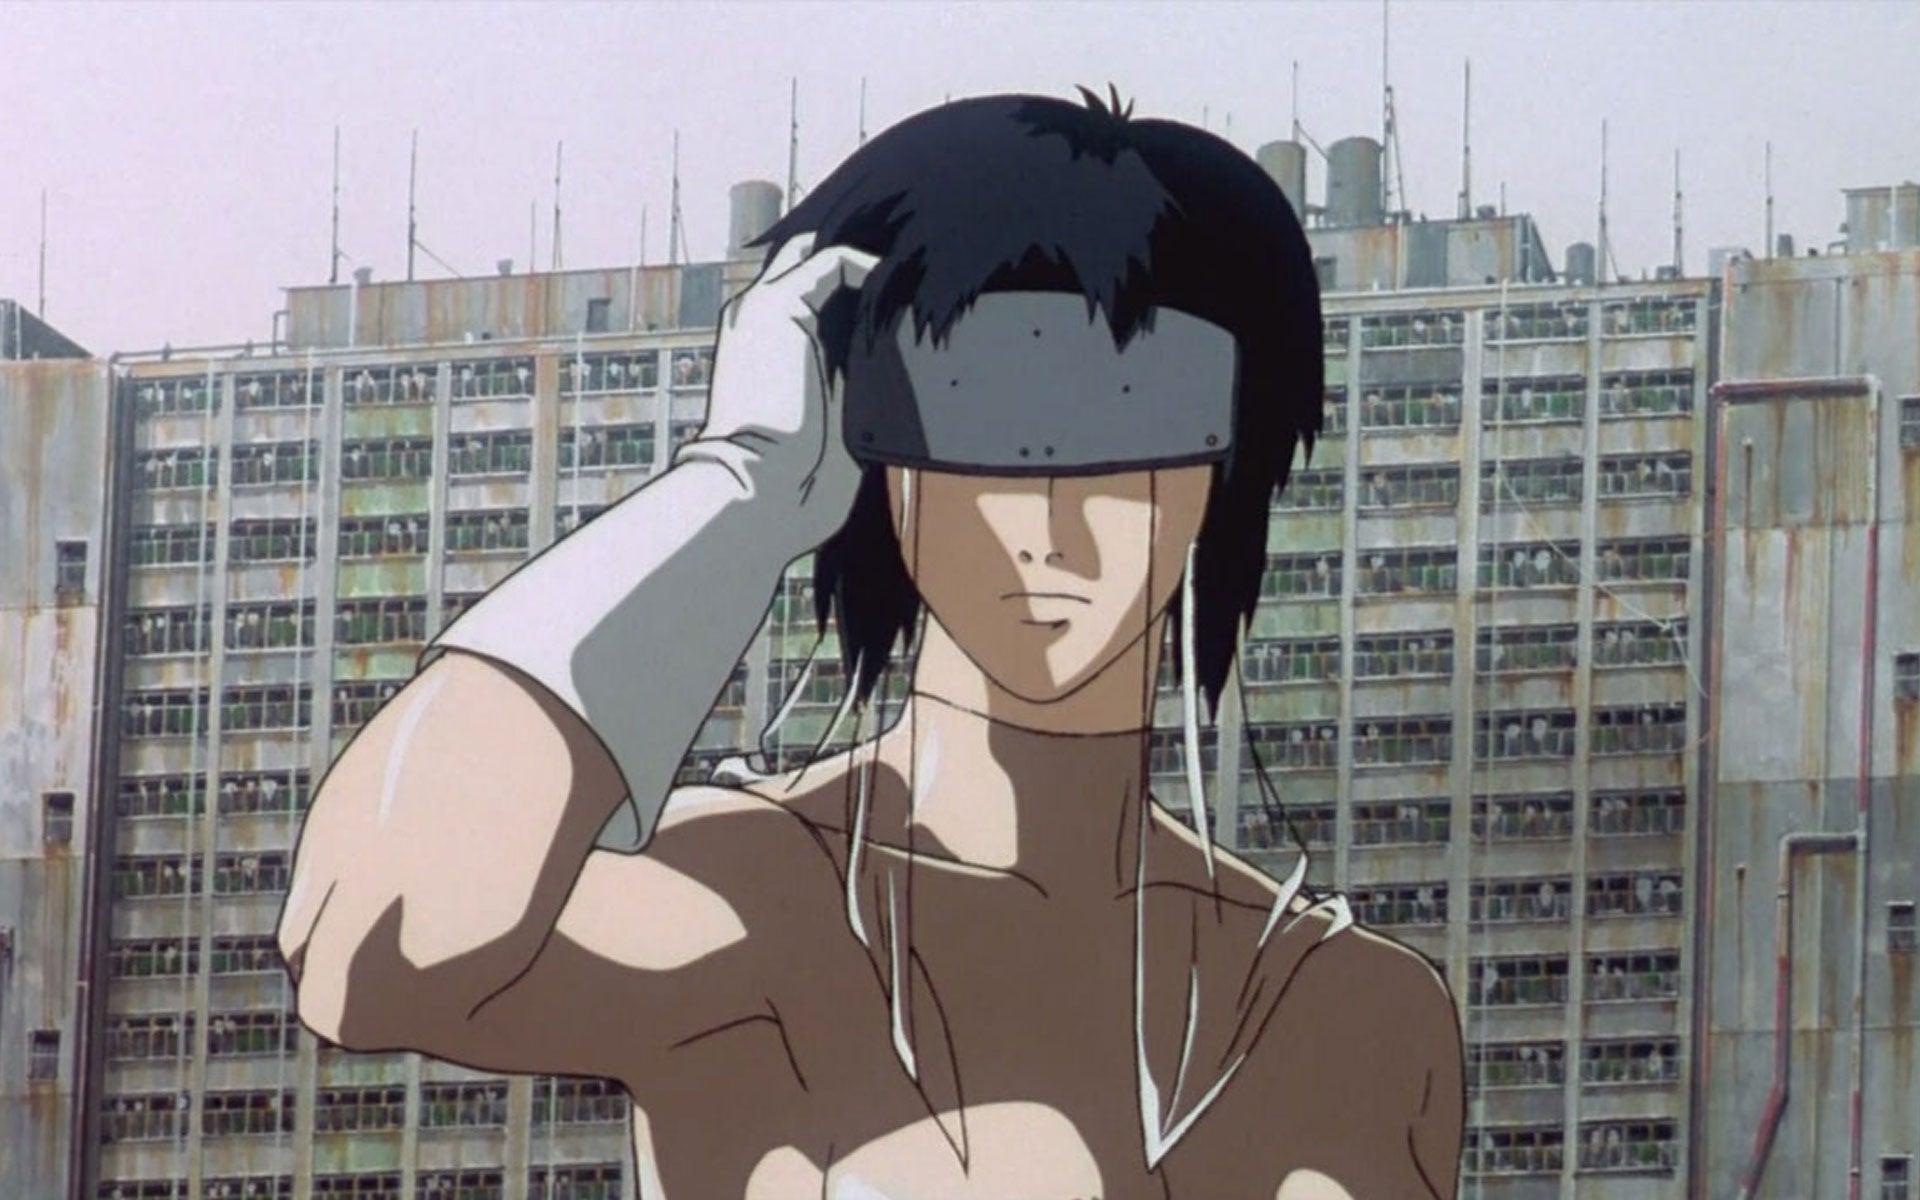 Why Mamoru Oshii Doesn't Want To Make Anime